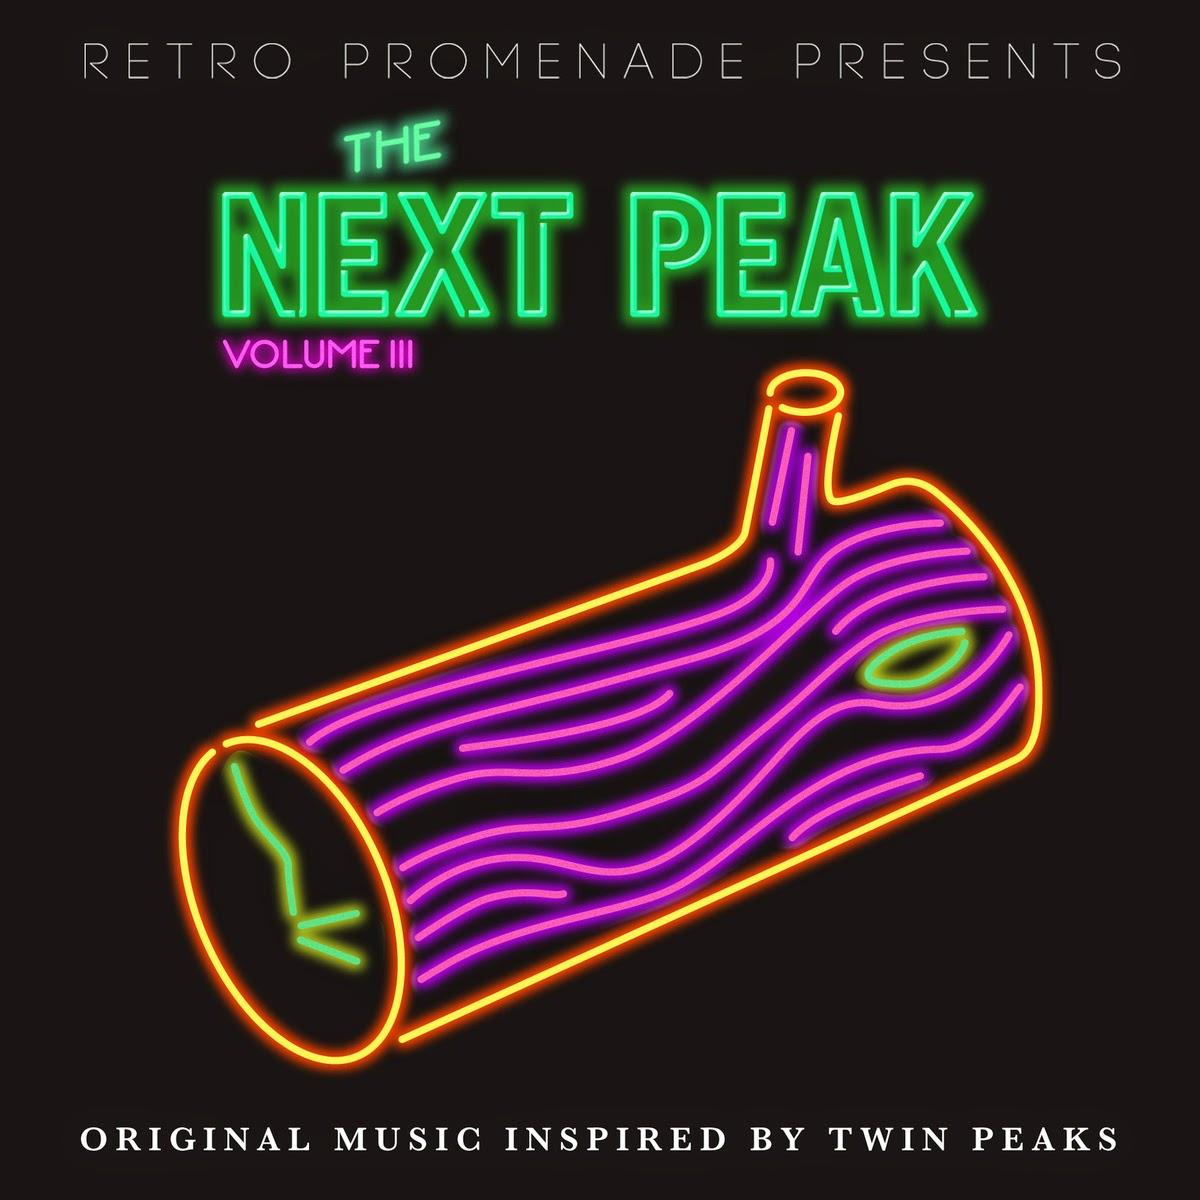 https://retropromenade.bandcamp.com/album/the-next-peak-vol-iii-twin-peaks-tribute